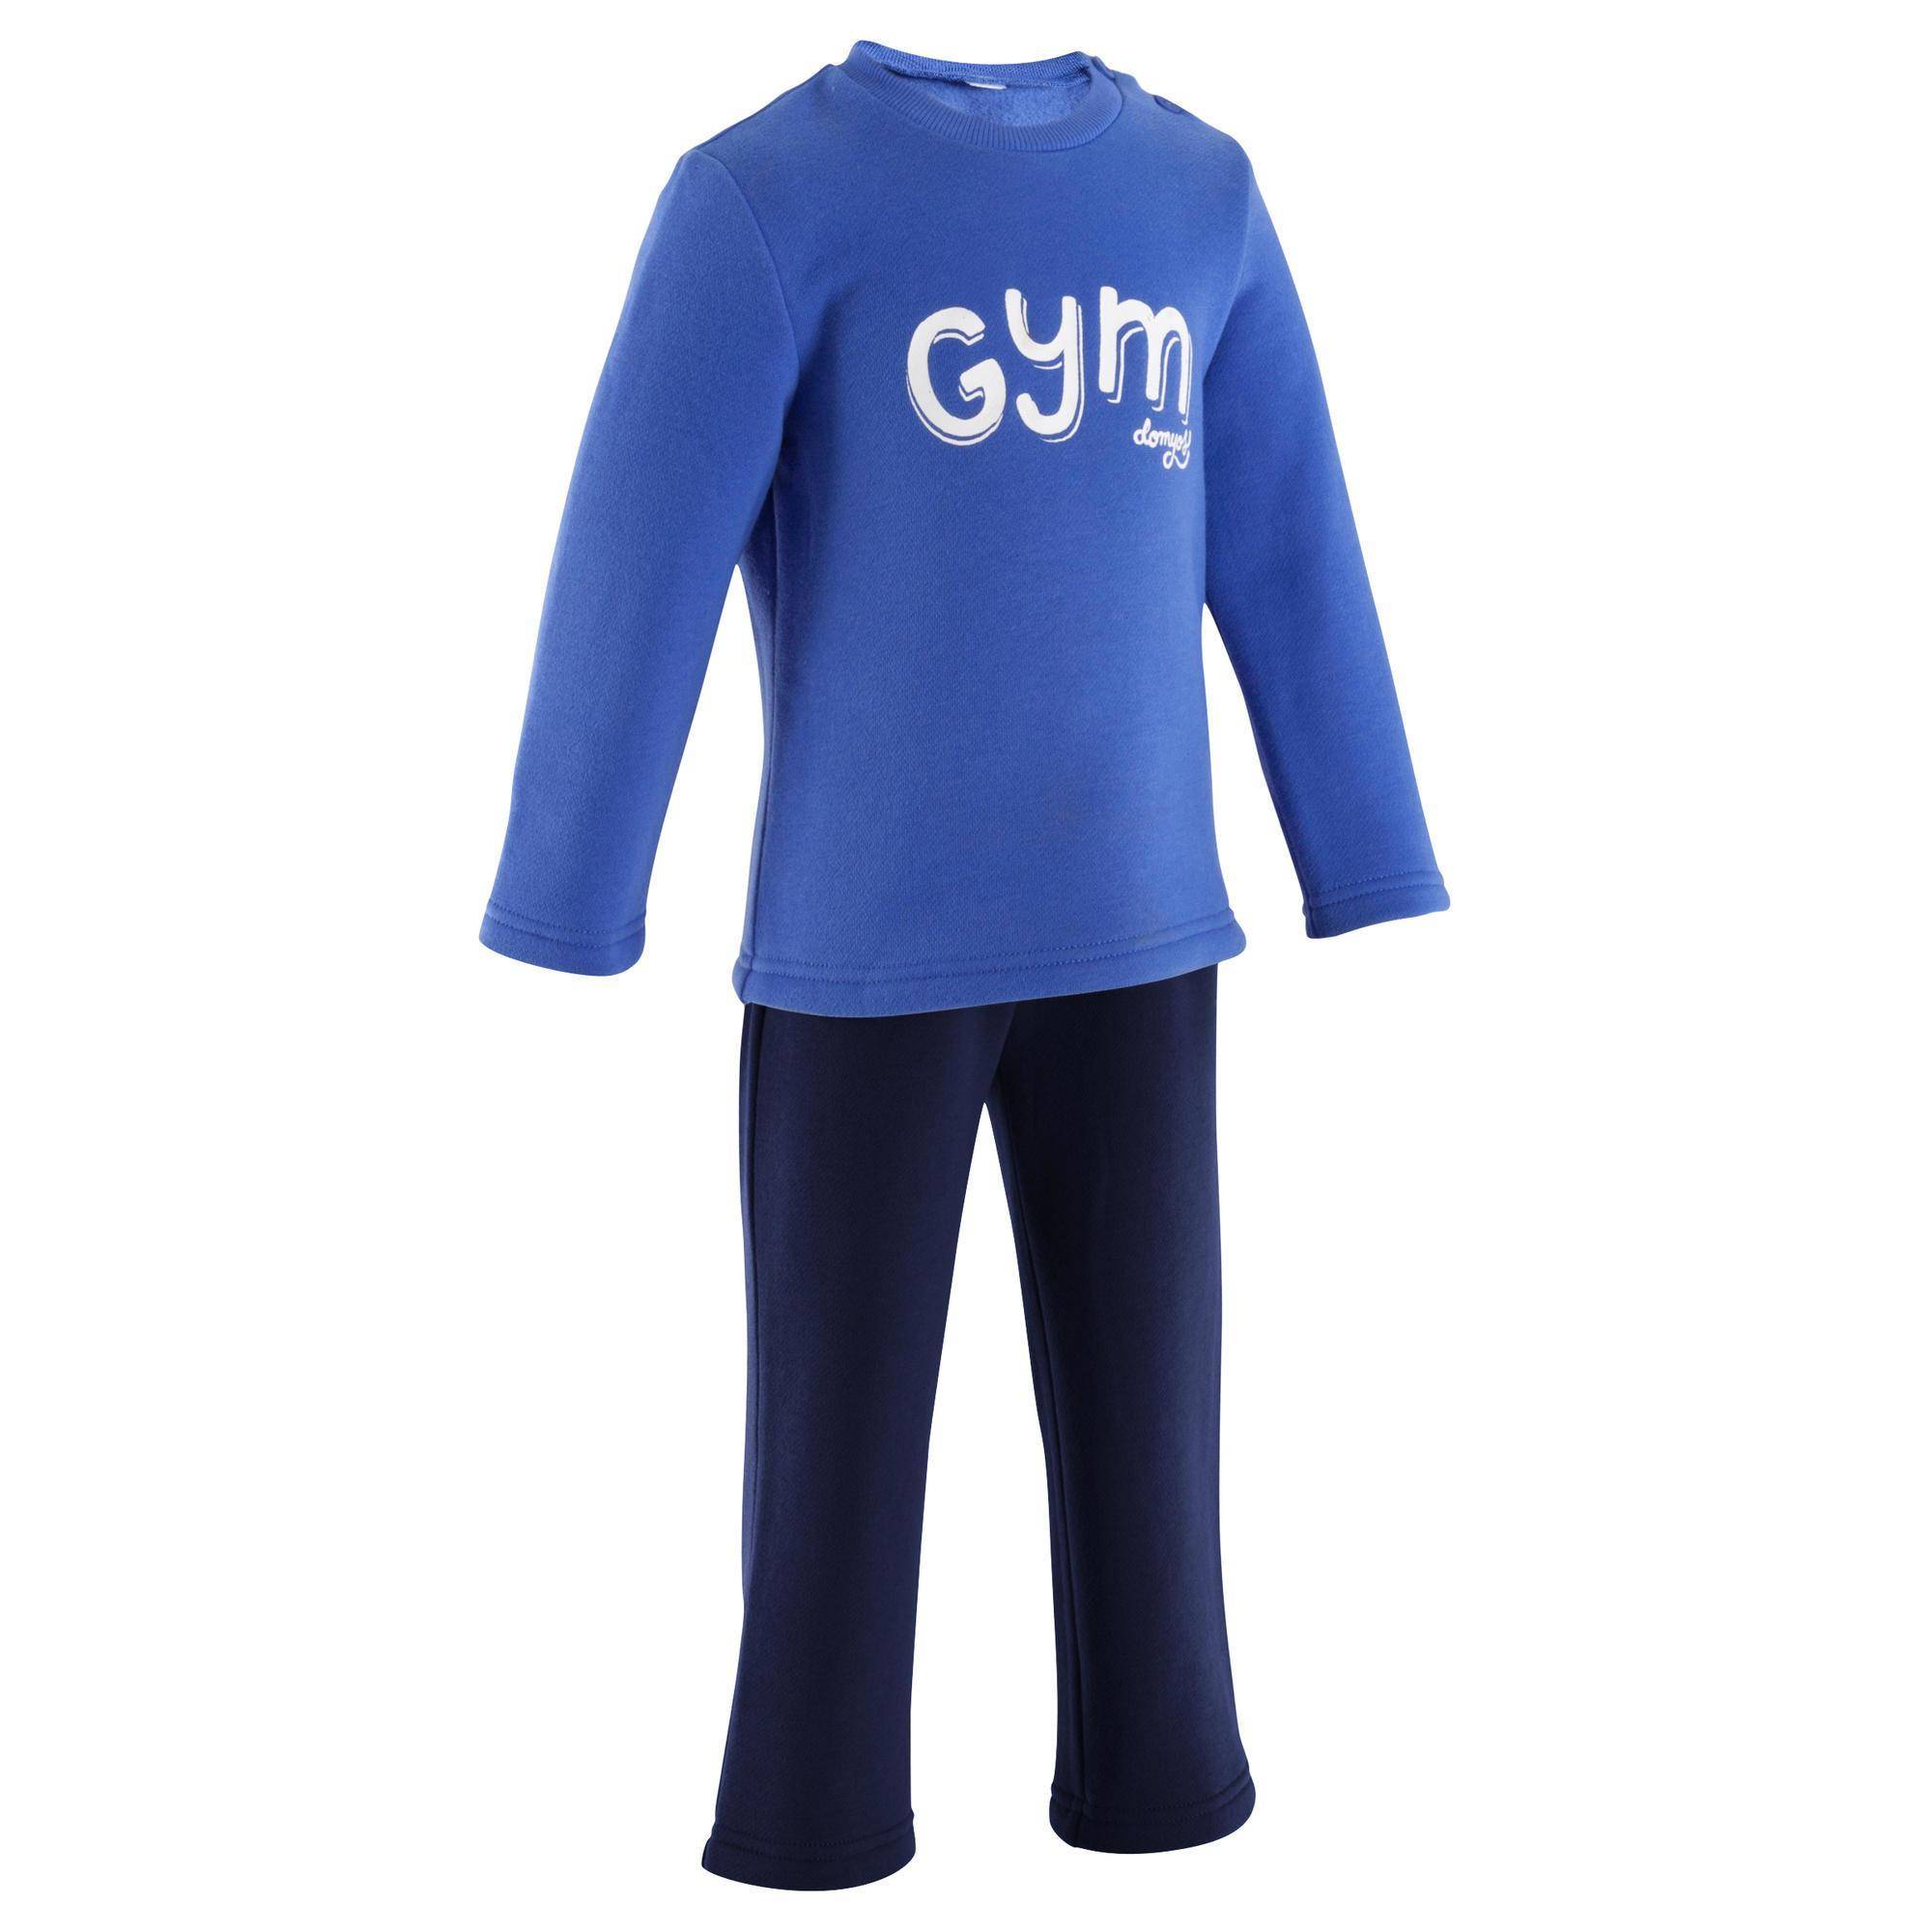 84a98e689723f Chándal fitness bebé WARM Y azul marino